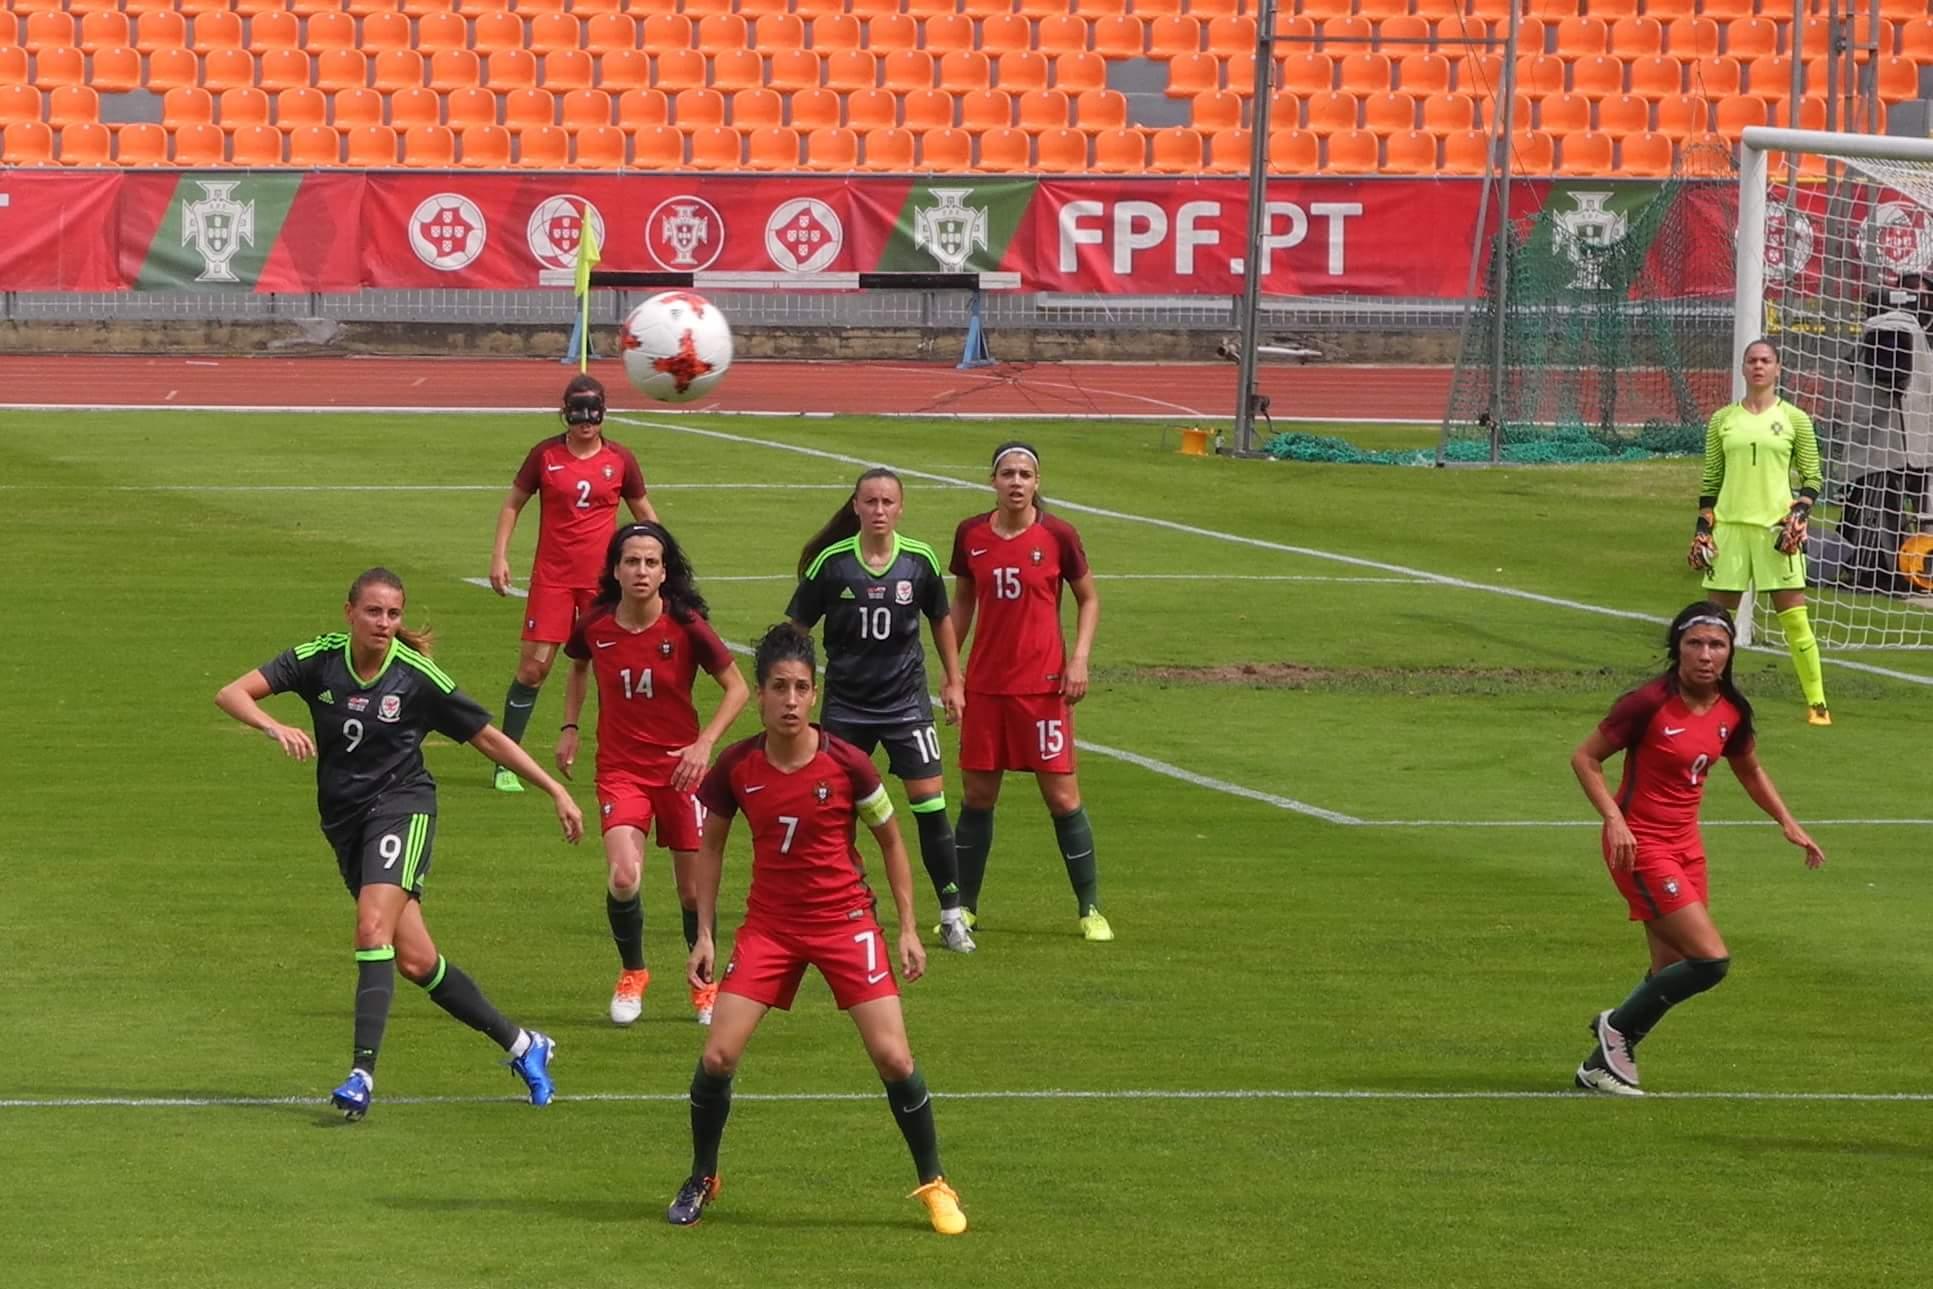 Foto: Joana Lima / Portal Futebol Feminino em Portugal